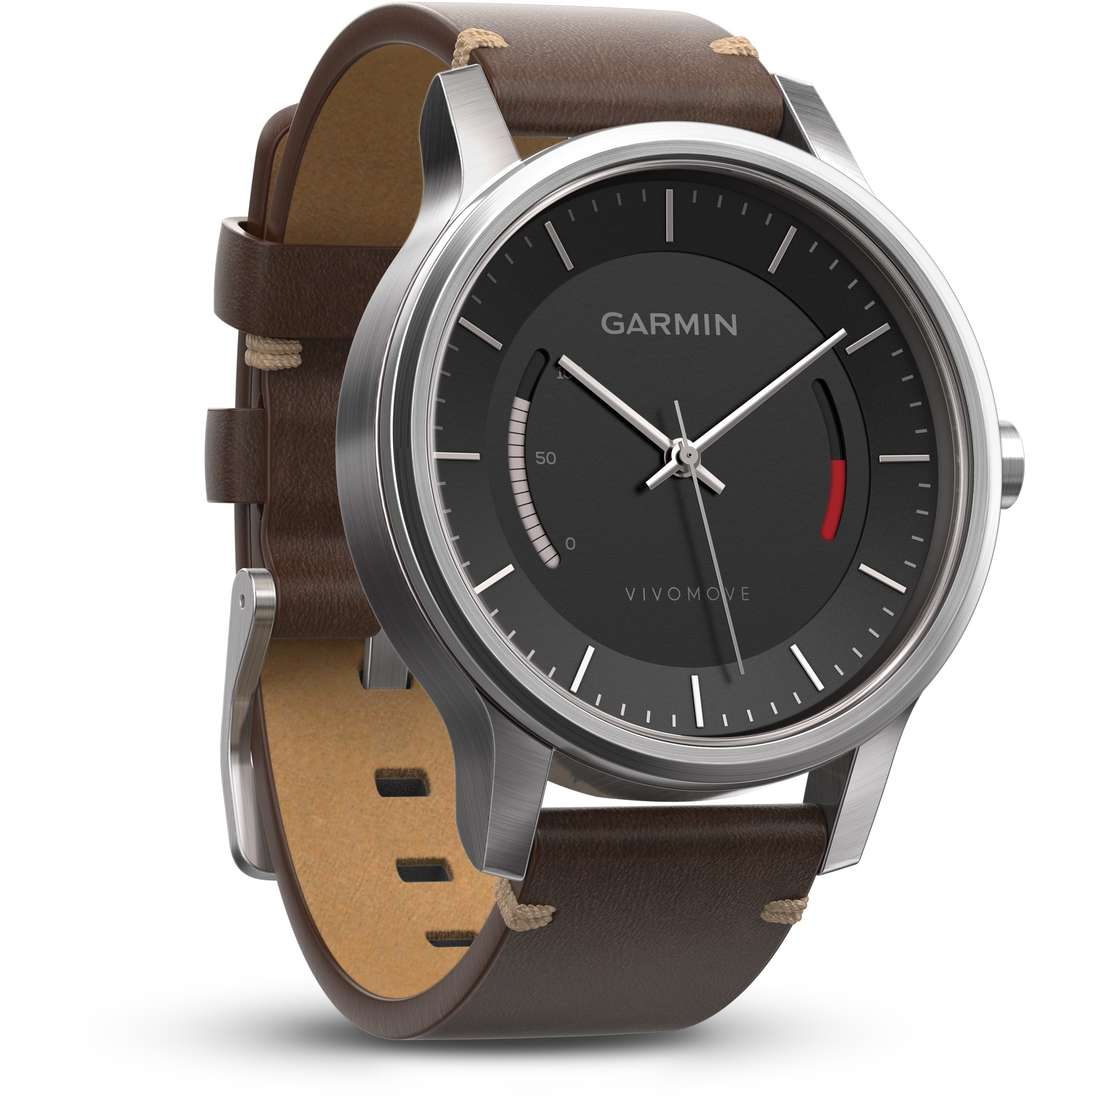 montre Smartwatch homme Garmin Vivomove 010-01597-20